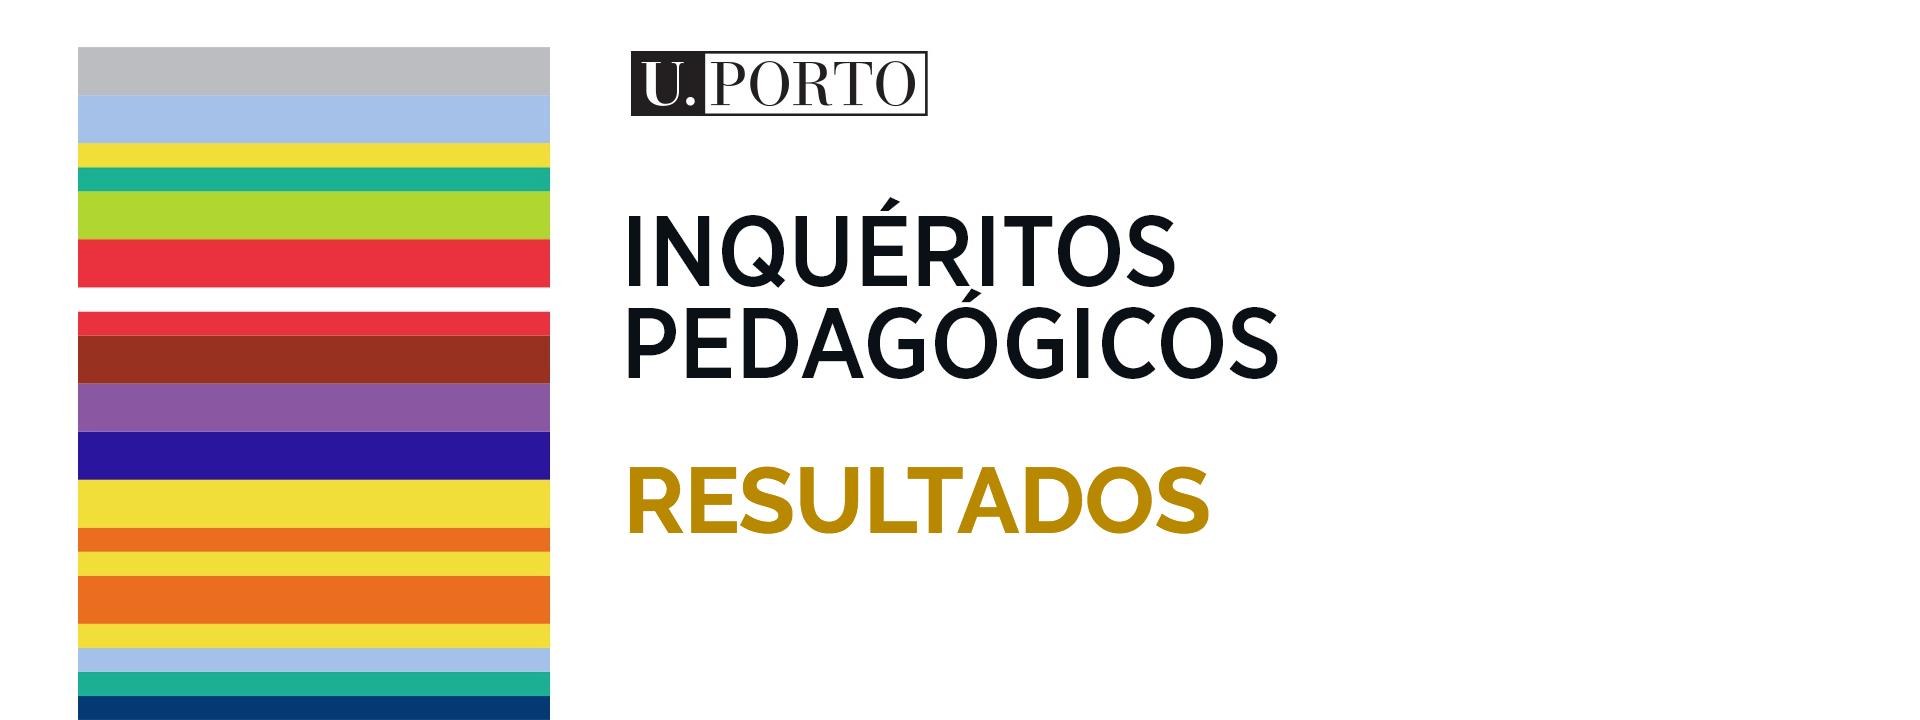 Resultados dos IPUPs 2 semestre 2017/2018